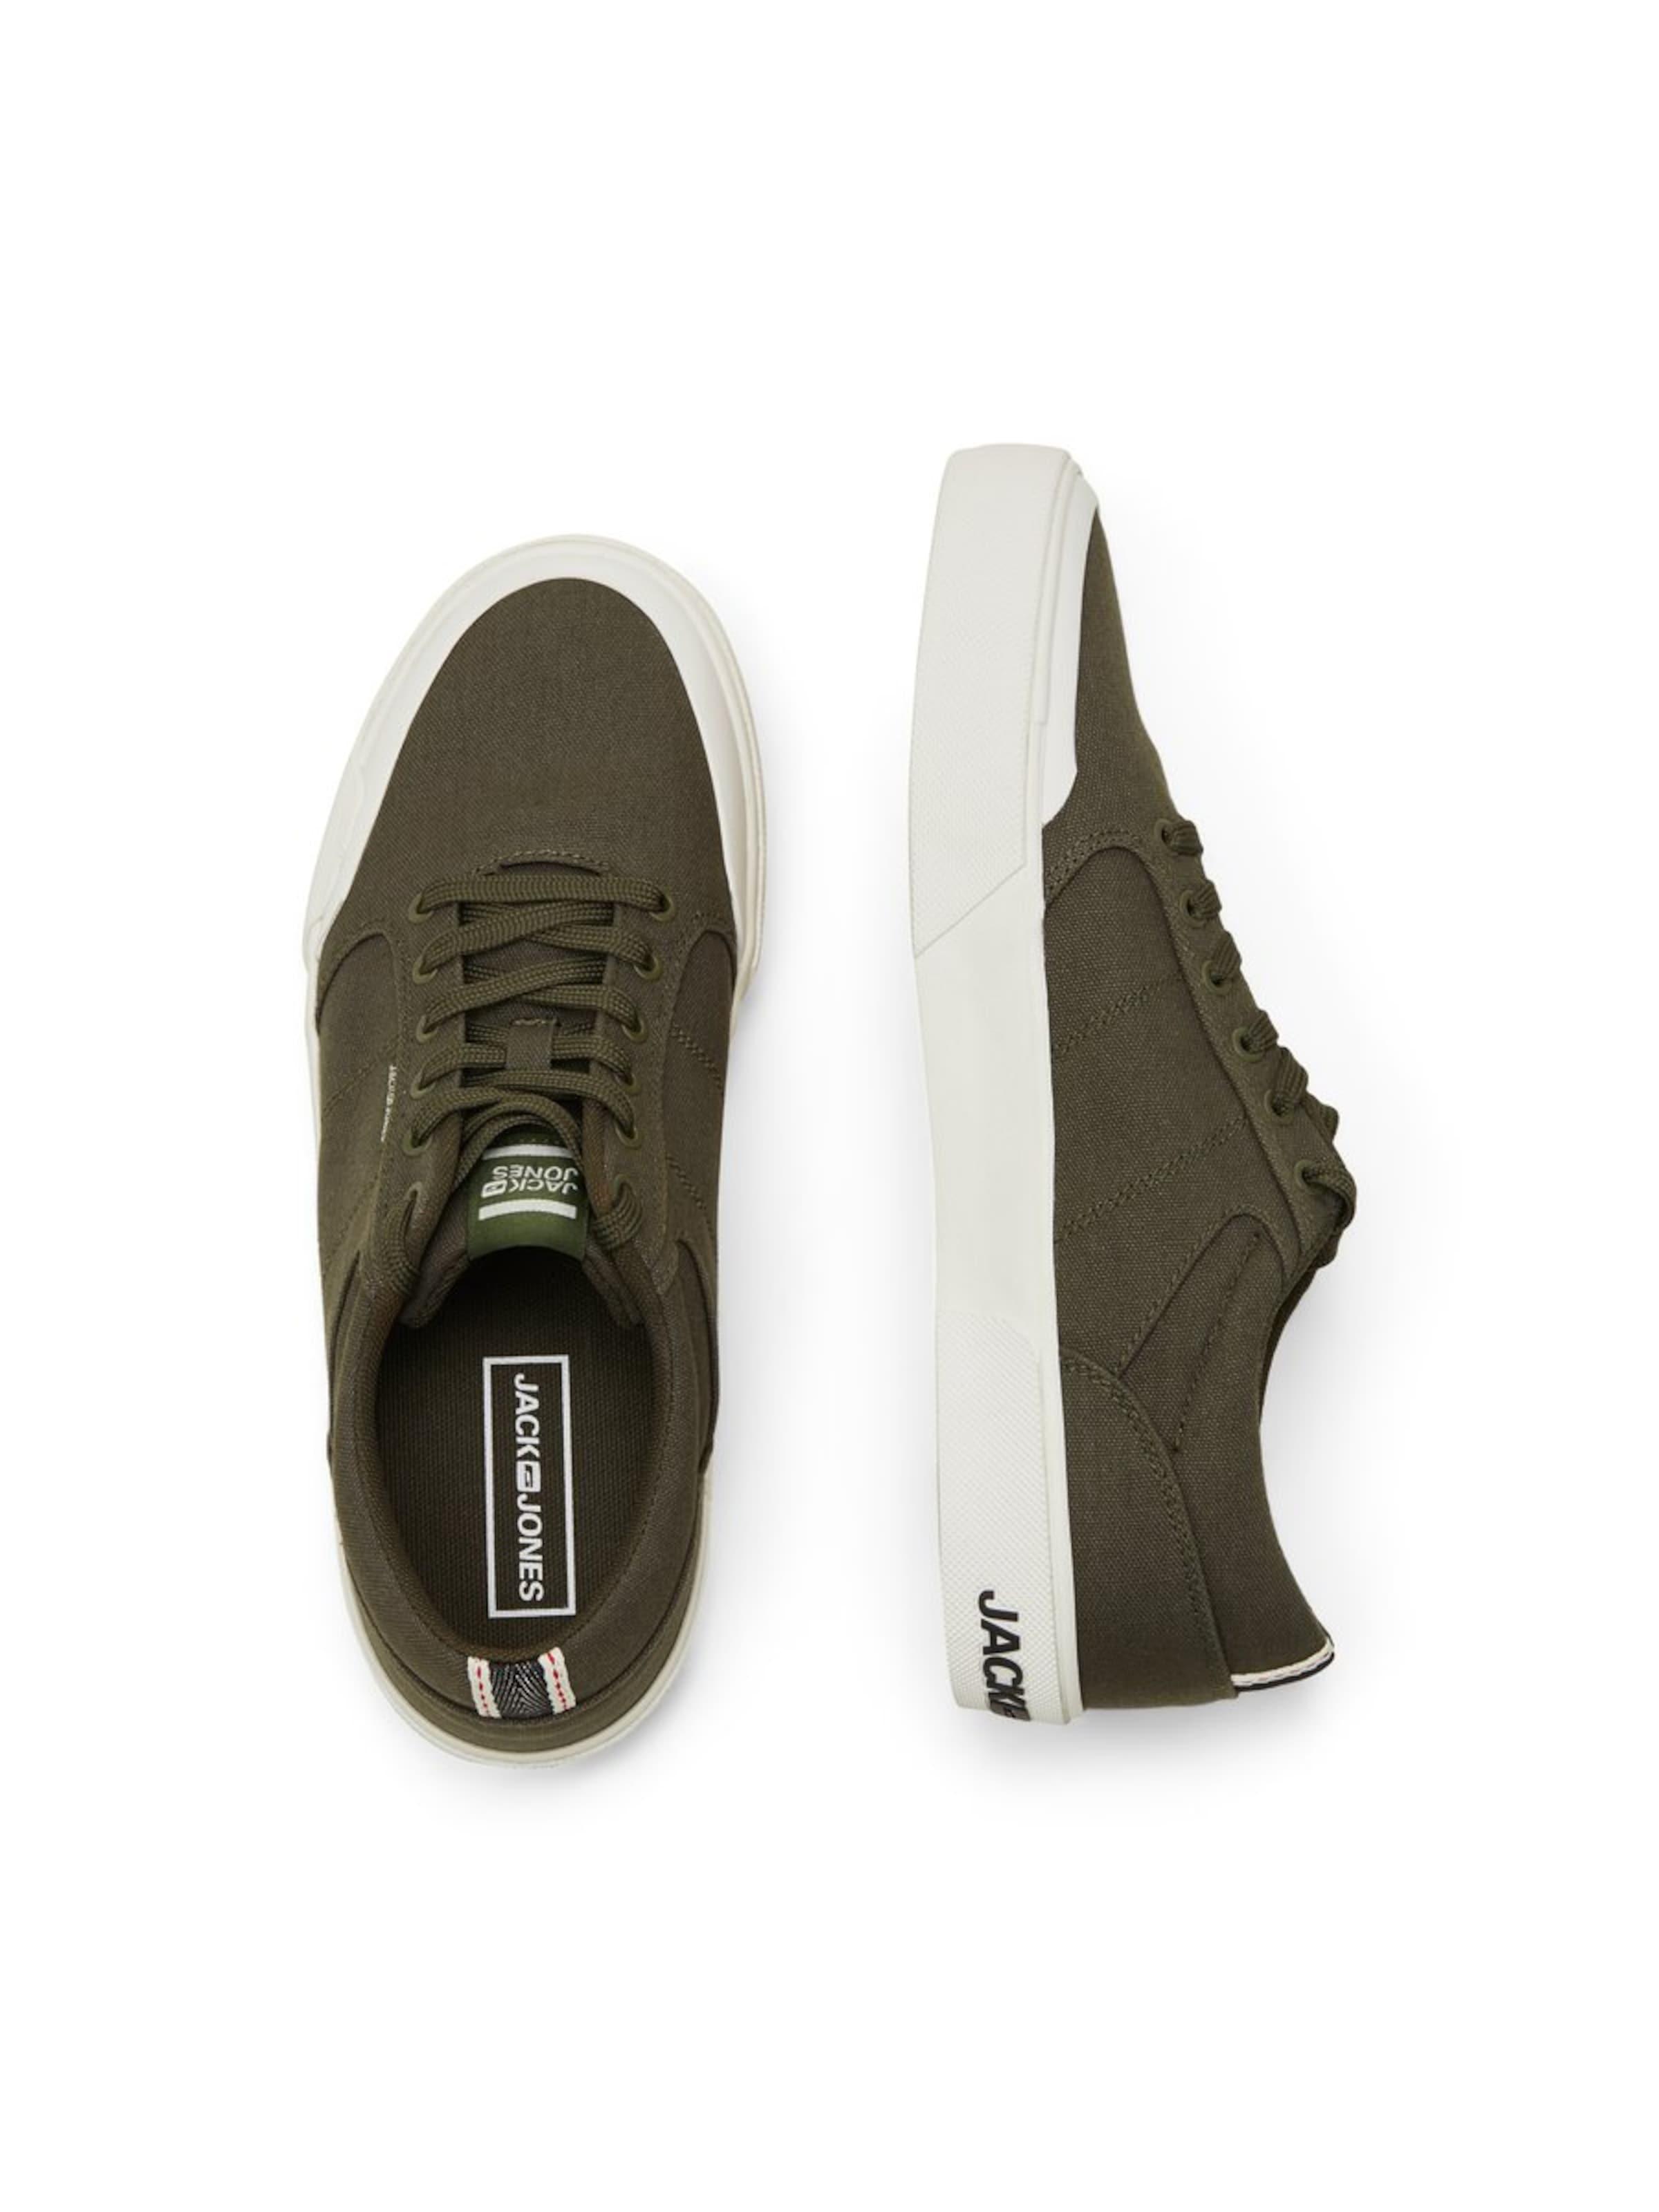 Sneaker Sneaker Oliv Jones Sneaker Jackamp; Oliv In Jones Jackamp; Jones Jackamp; In m8n0wvN